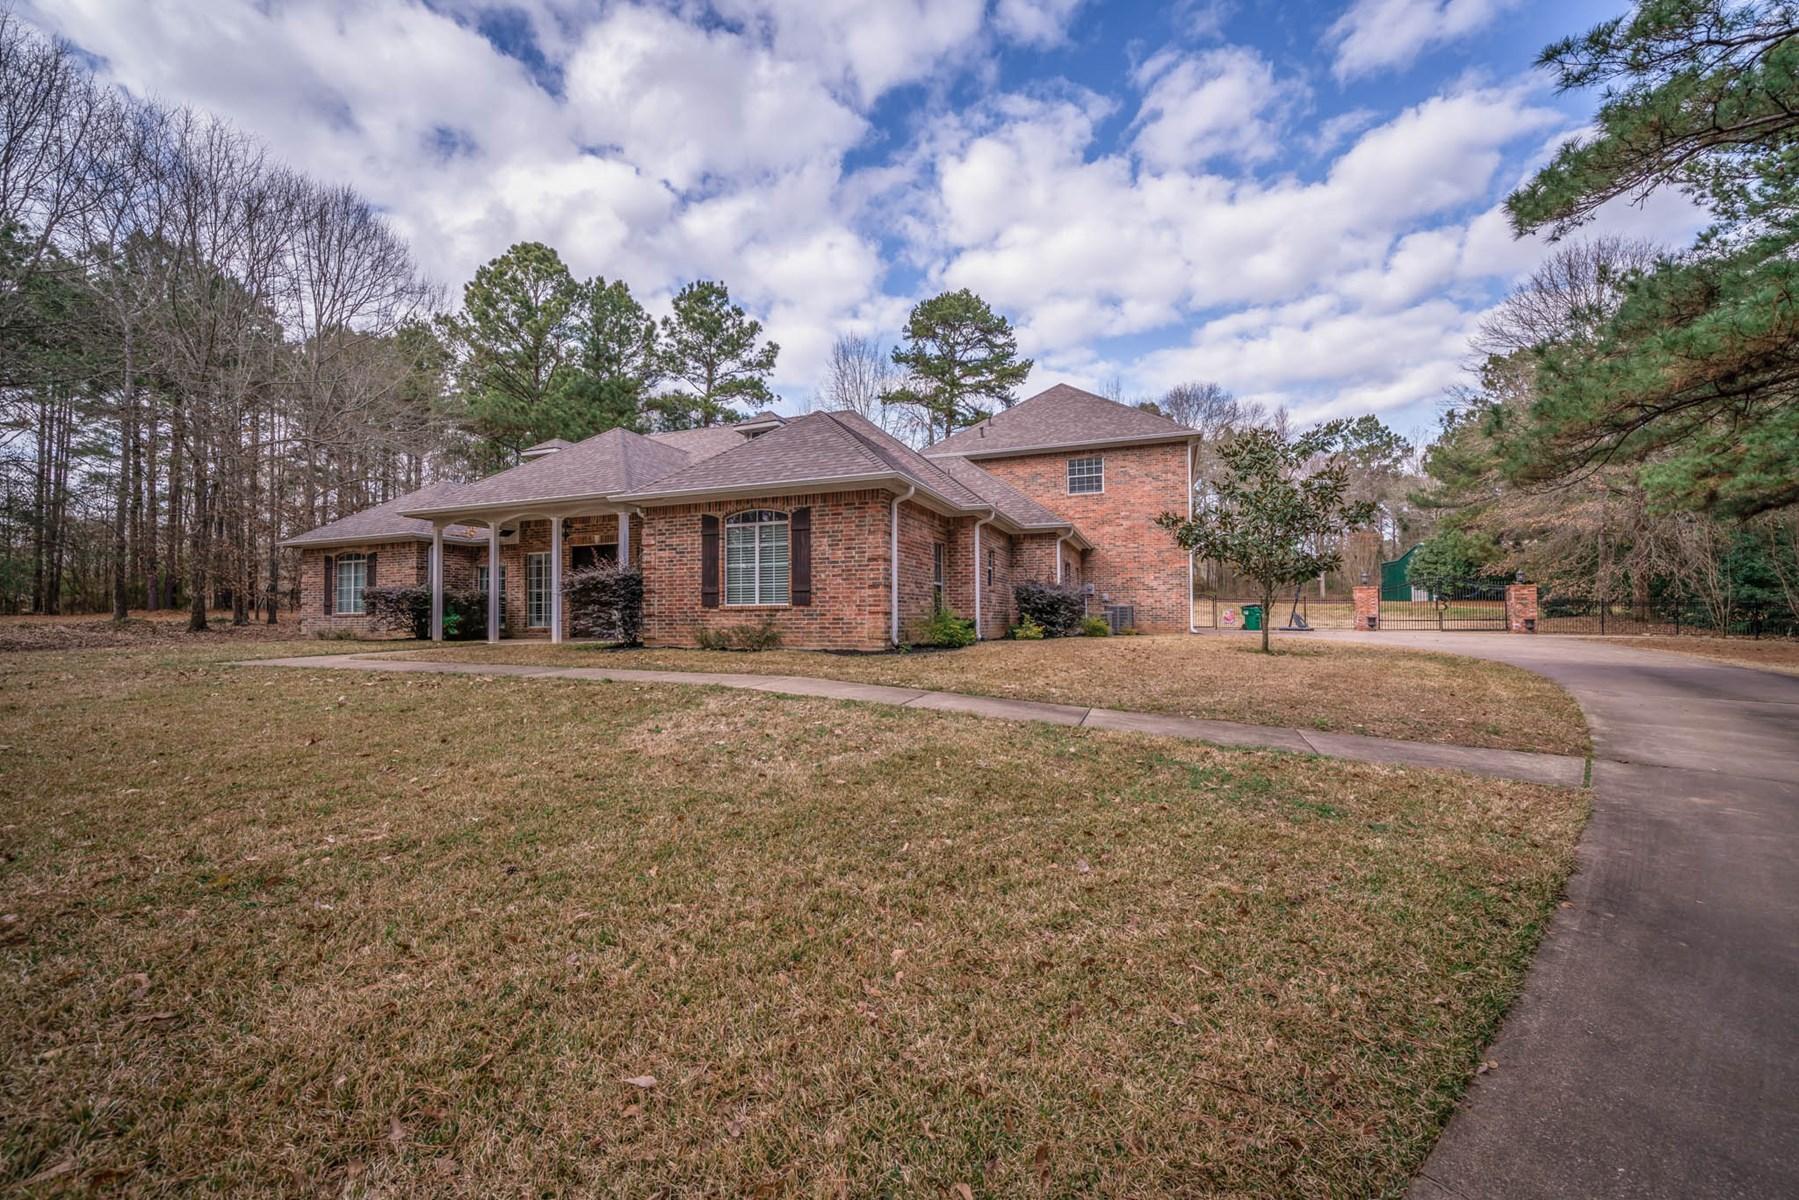 Country Home For Sale iIn Longview, Texas.